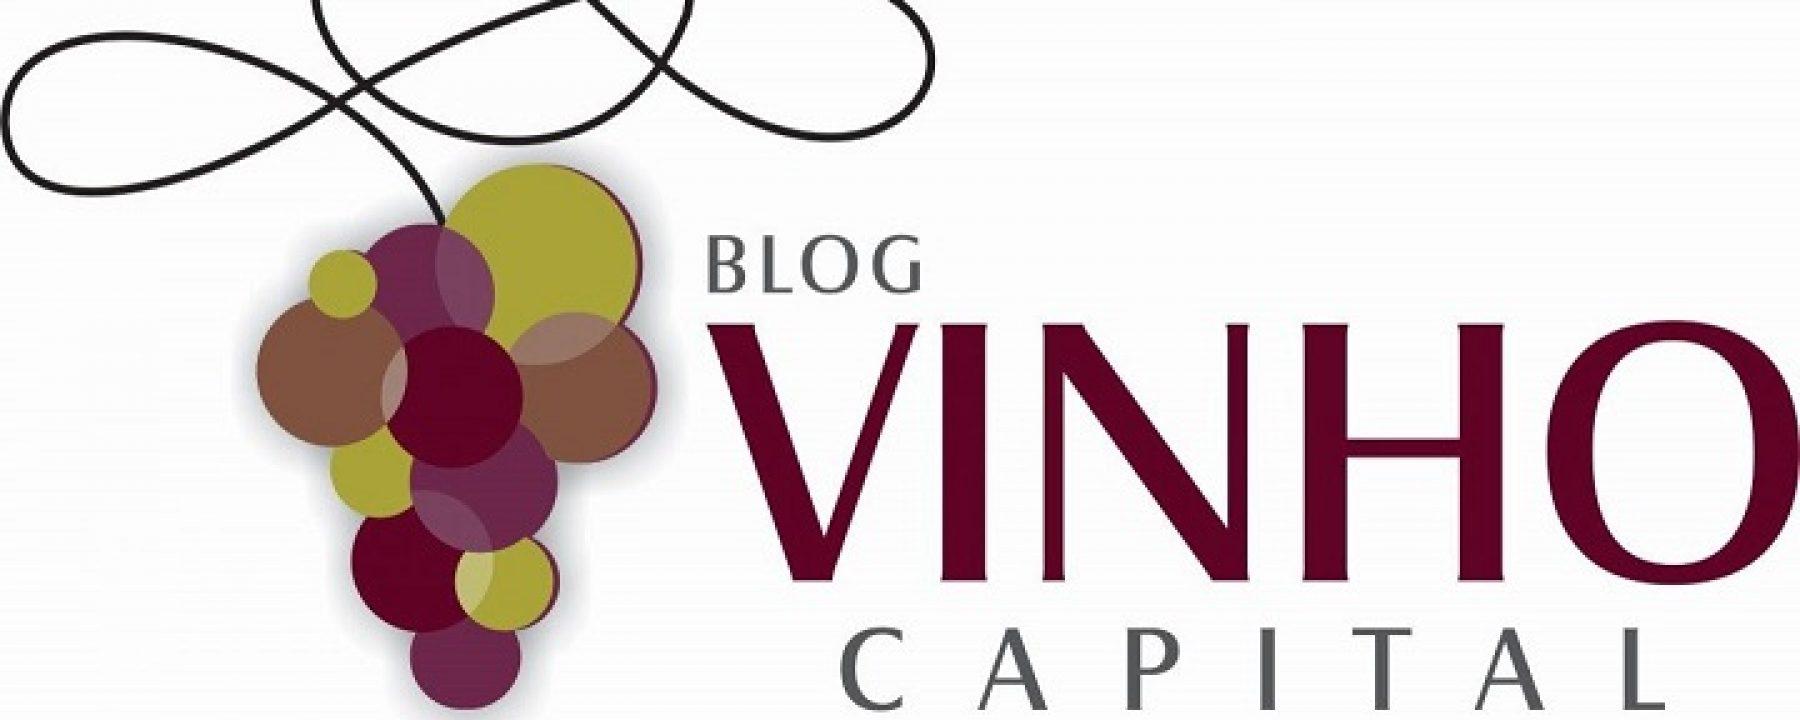 cropped-cropped-cropped-thumbnail_logo-blog-vinho-capital-aprovada132.jpg